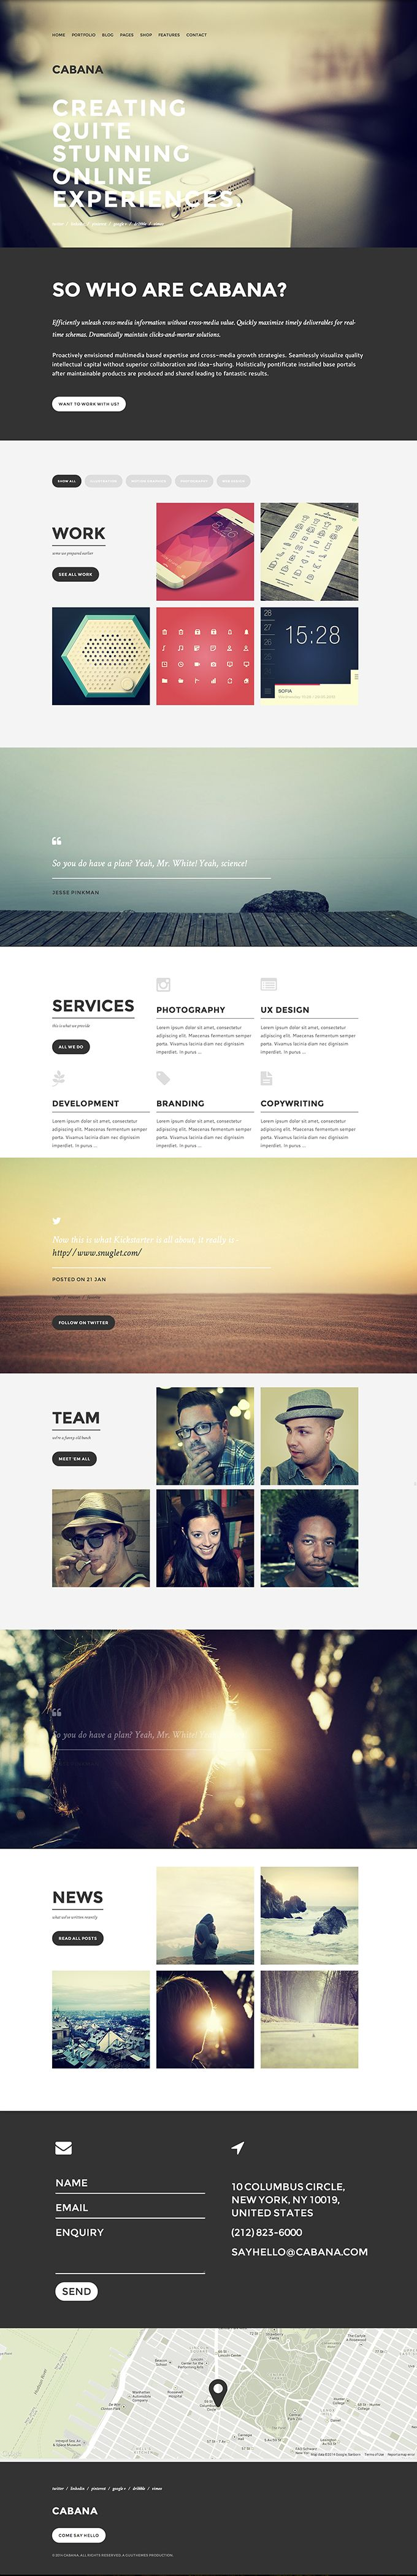 Cabana - a creative portfolio theme for WordPress